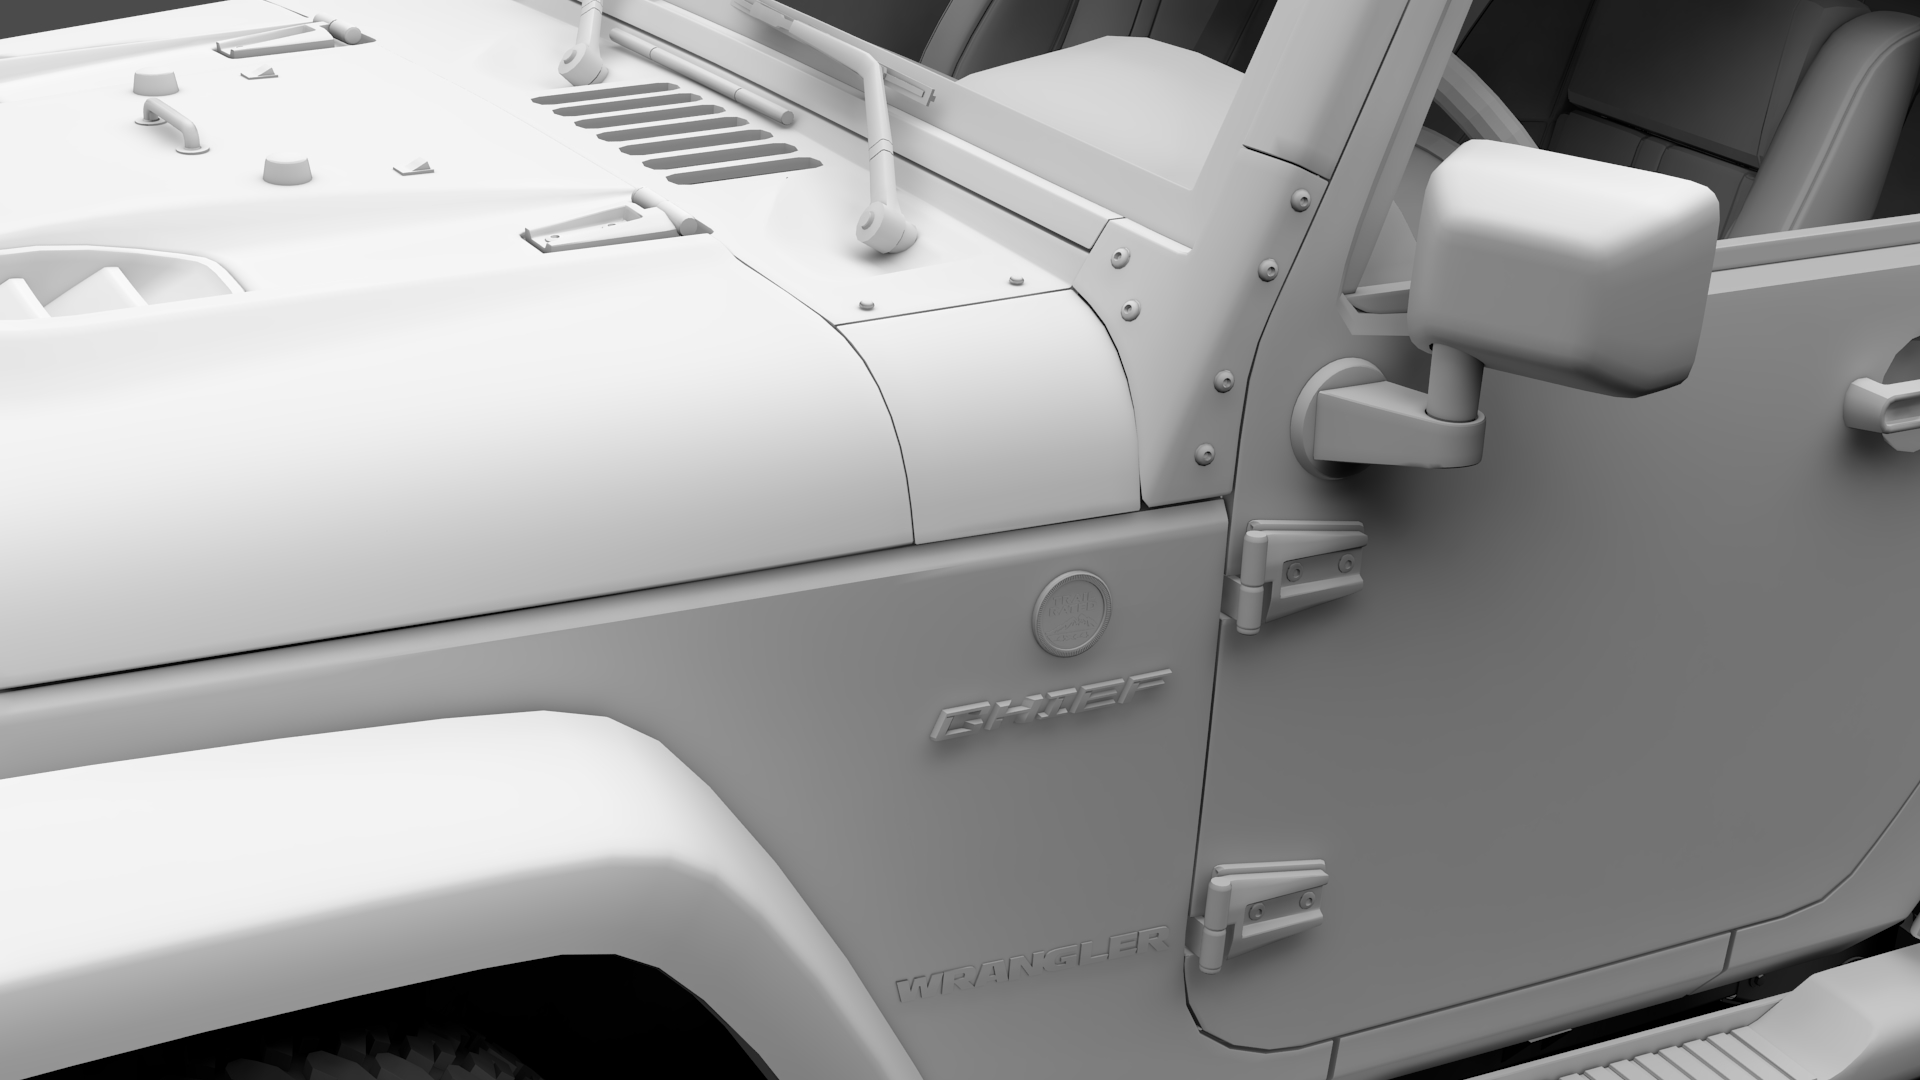 jeep wrangler chief jk 2017 3d model max fbx c4d lwo ma mb hrc xsi obj 276893